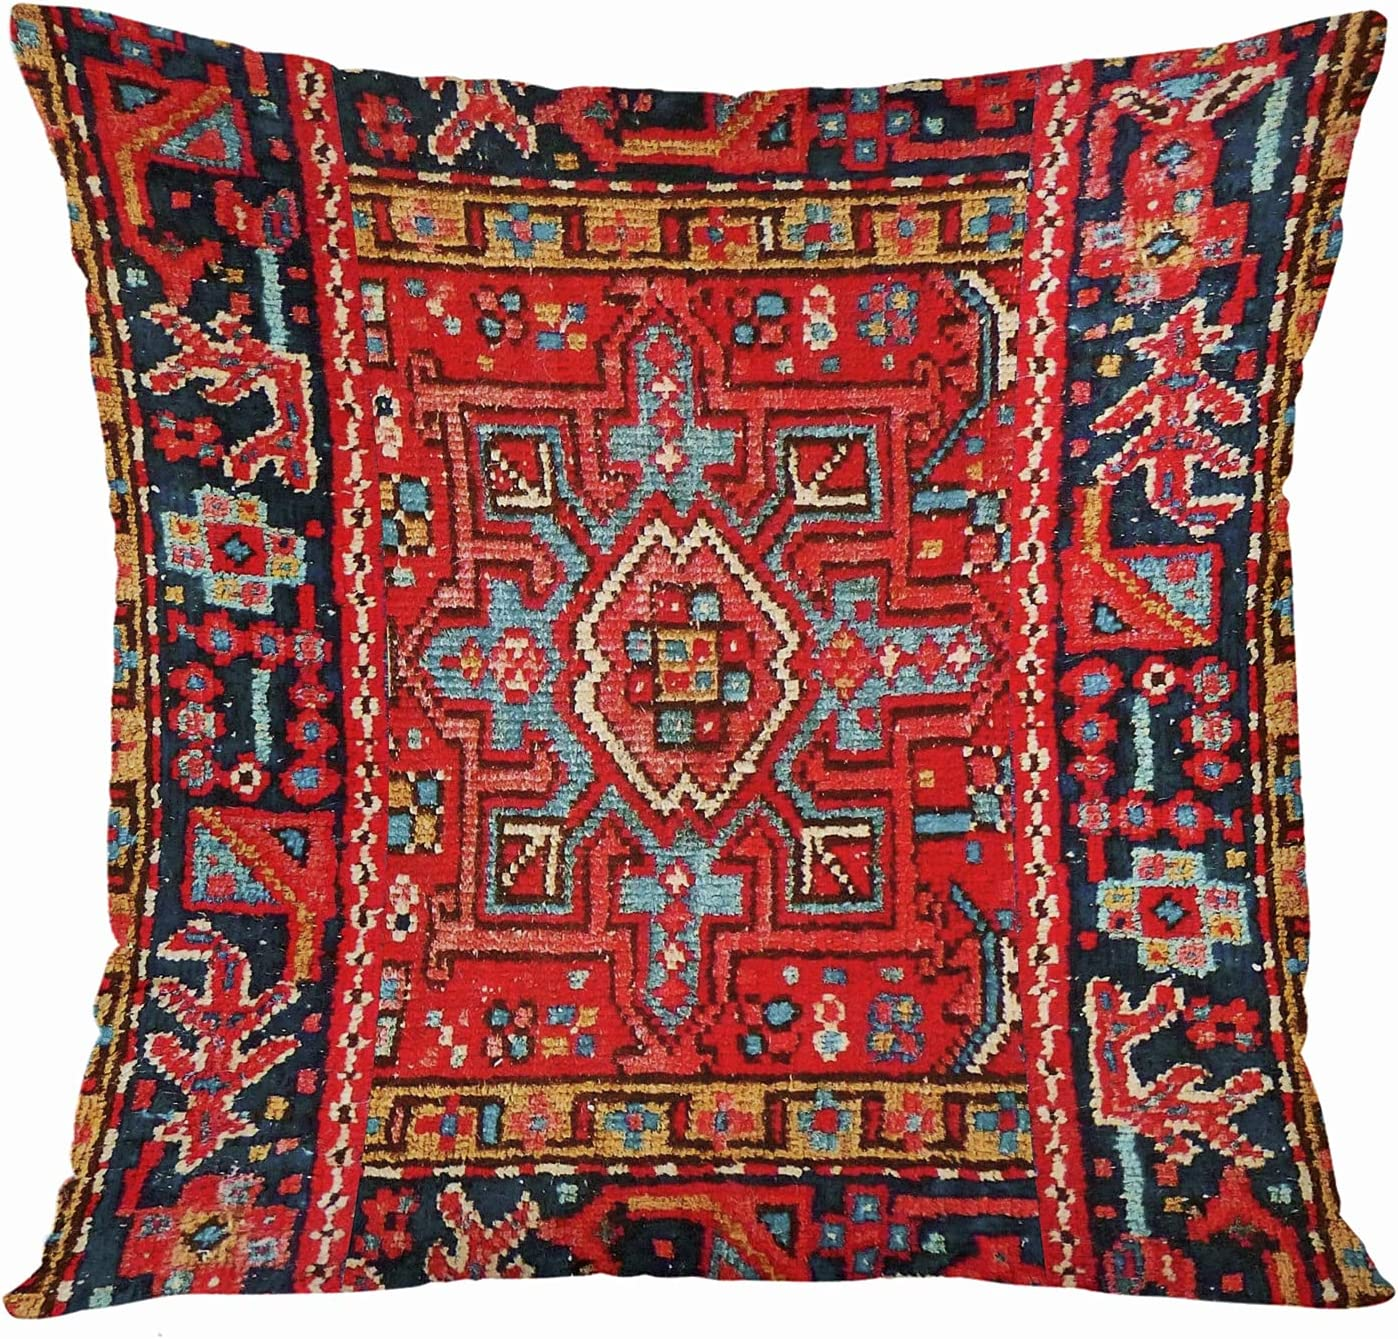 VANMI Throw Pillow Cover Orange Persian Design Decorative Oversized Pillow Case Home Decor Square 20x20 Inches Pillowcase